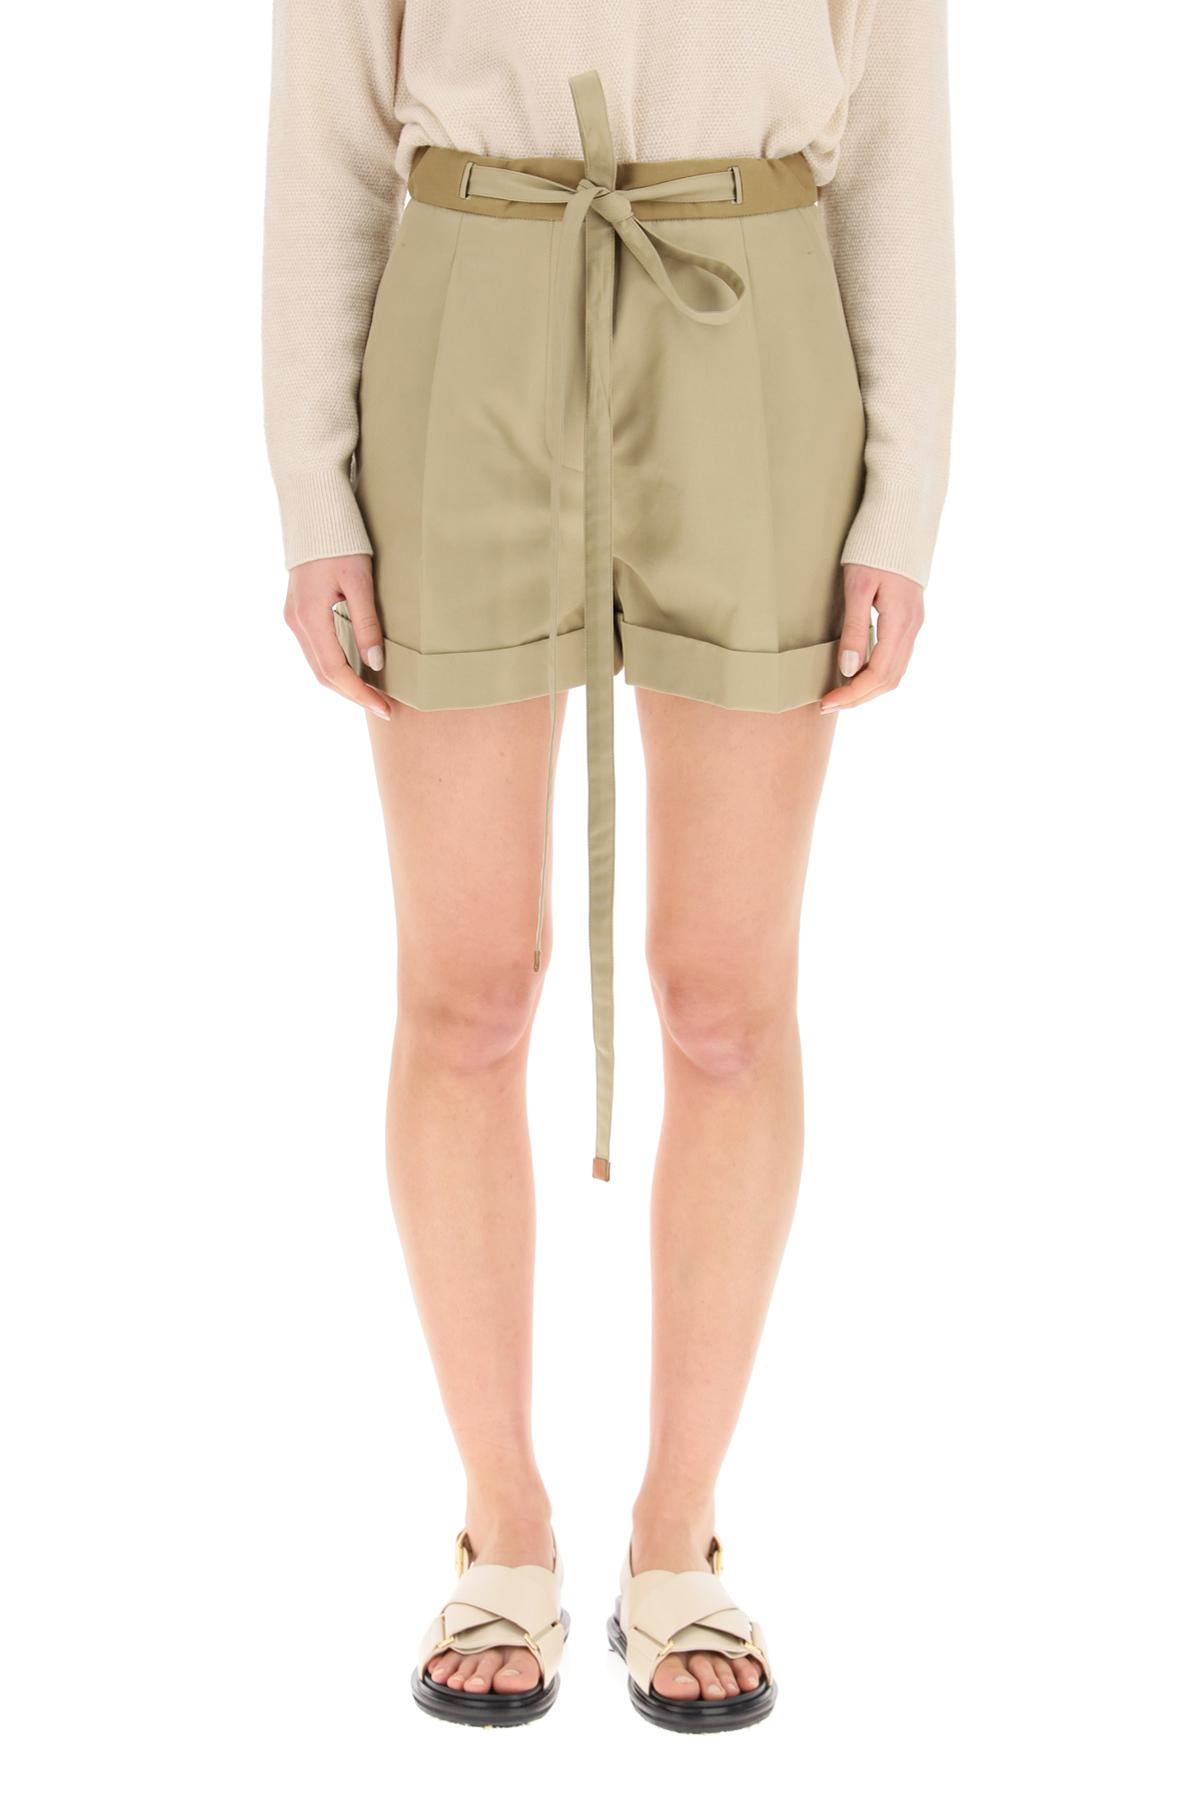 Loewe shorts con cintura